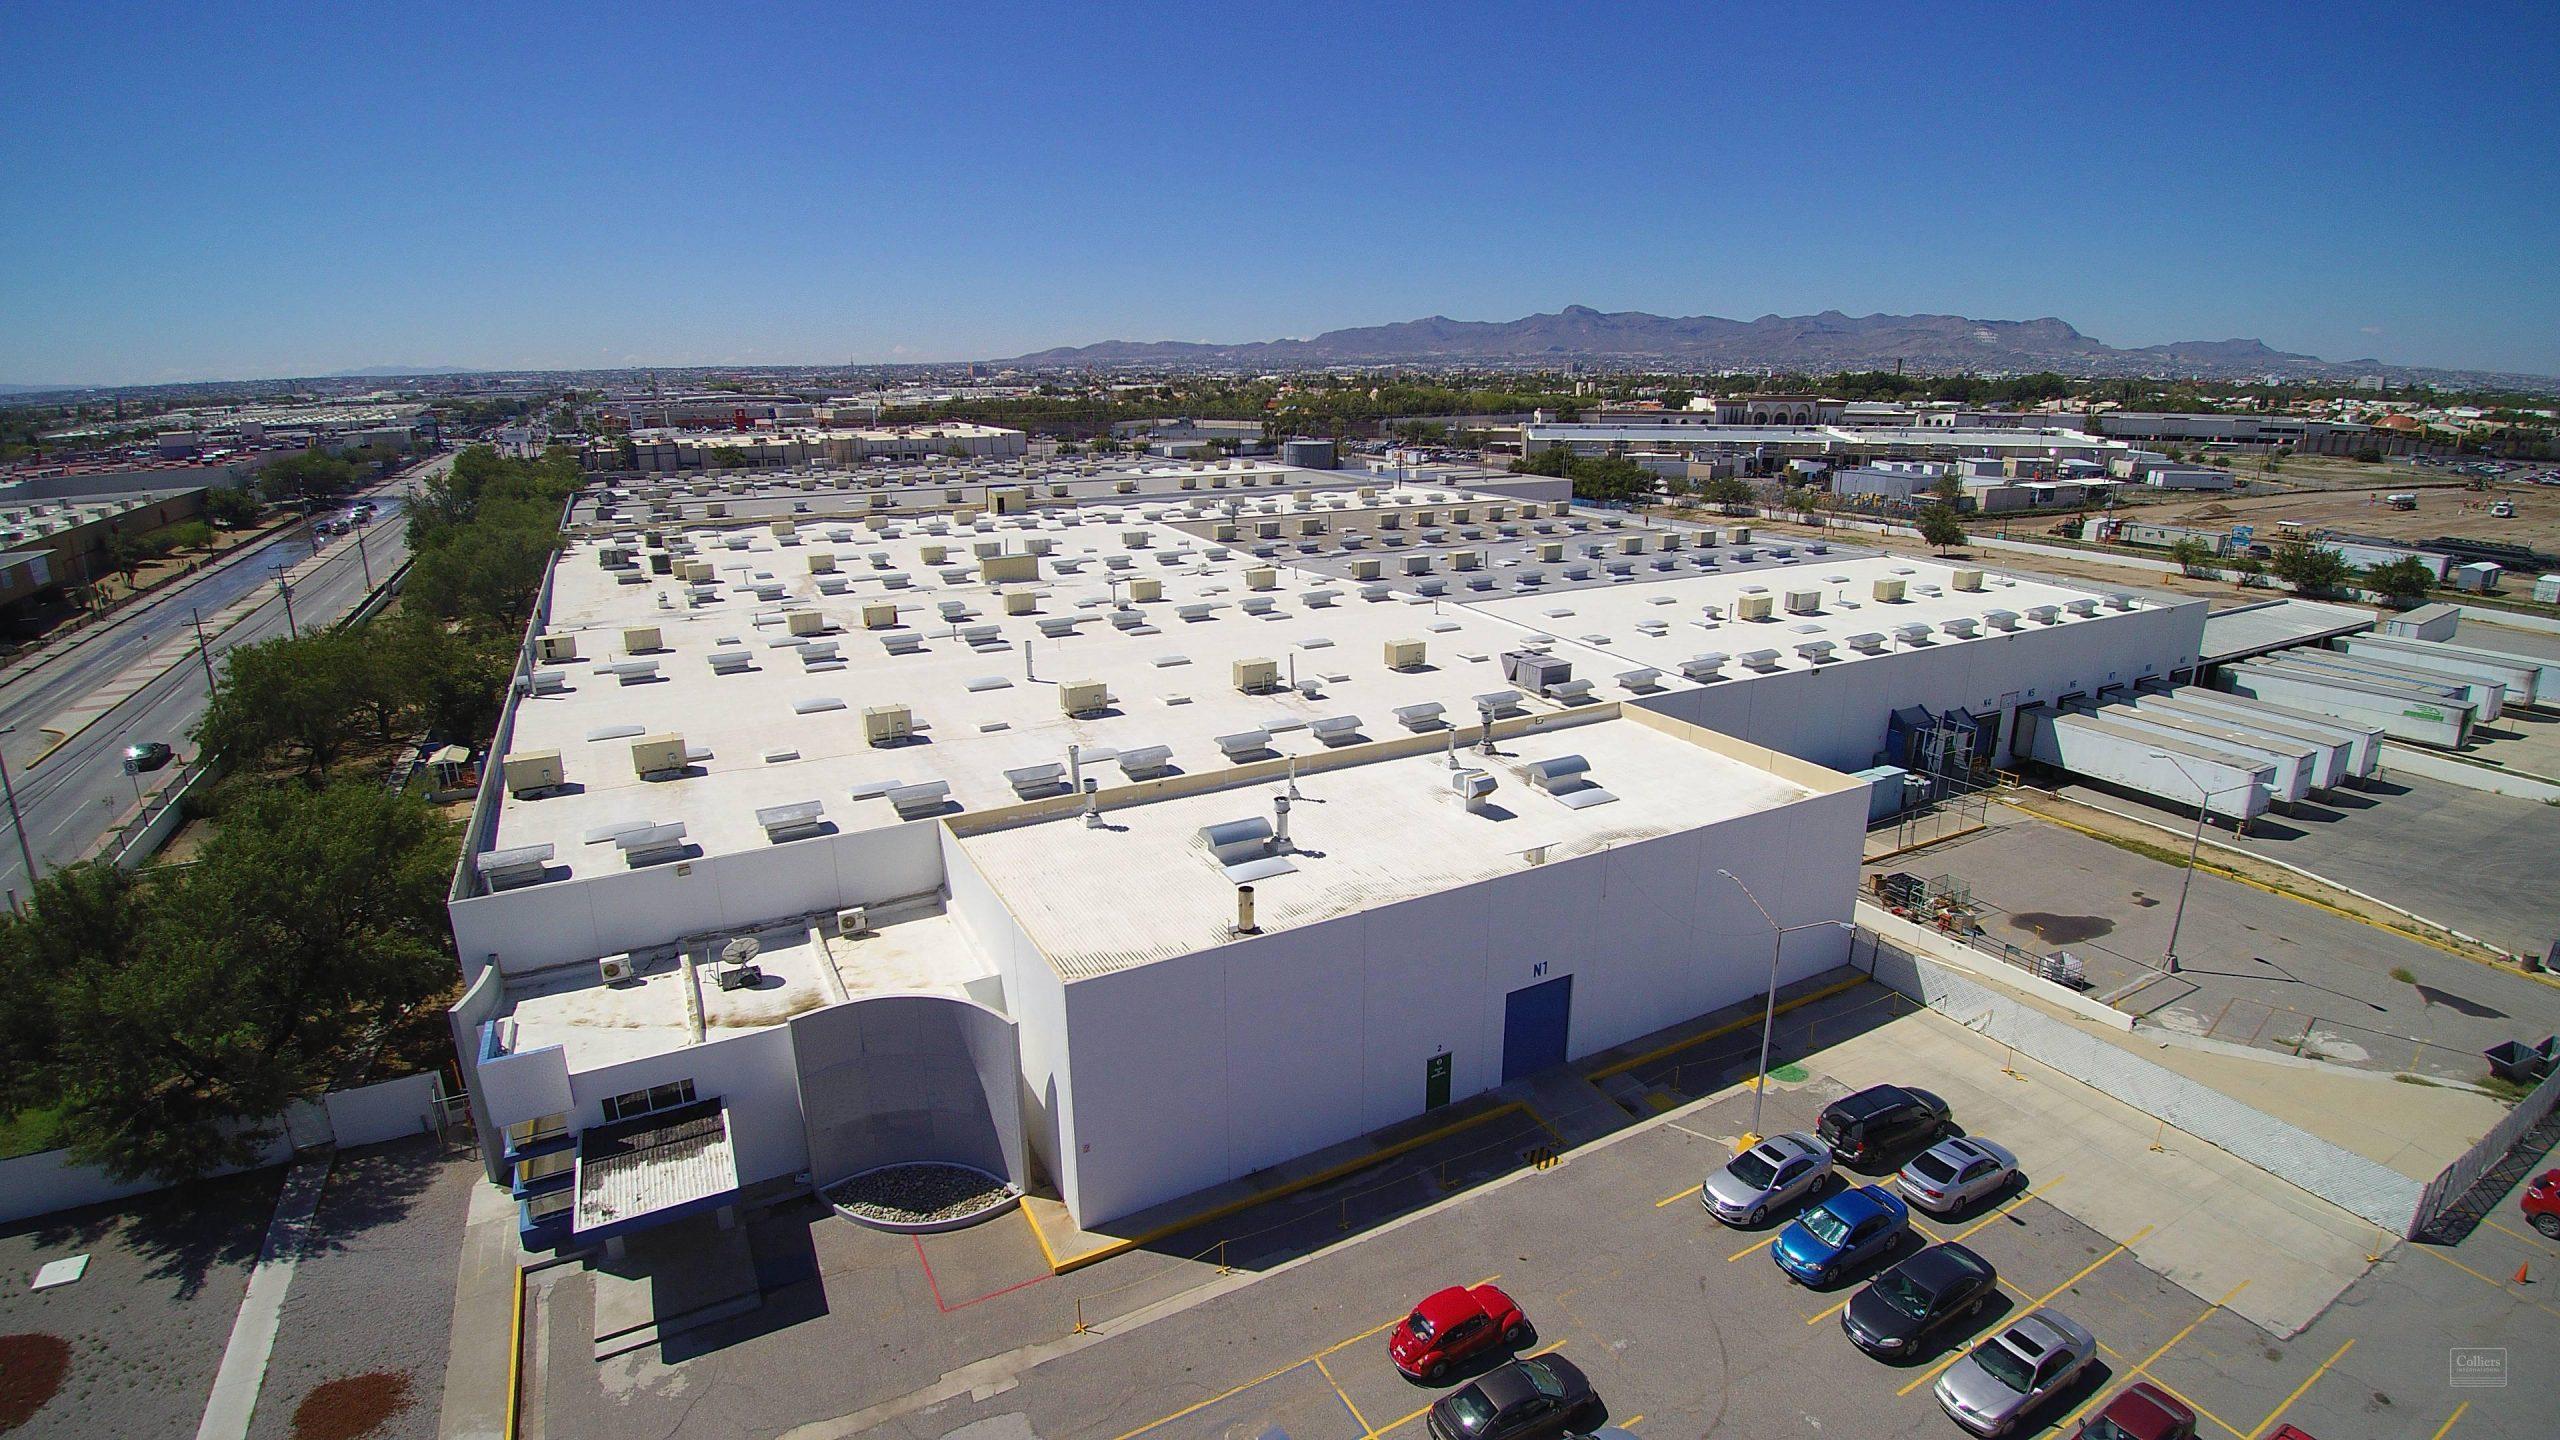 90% of companies remain closed in Juarez